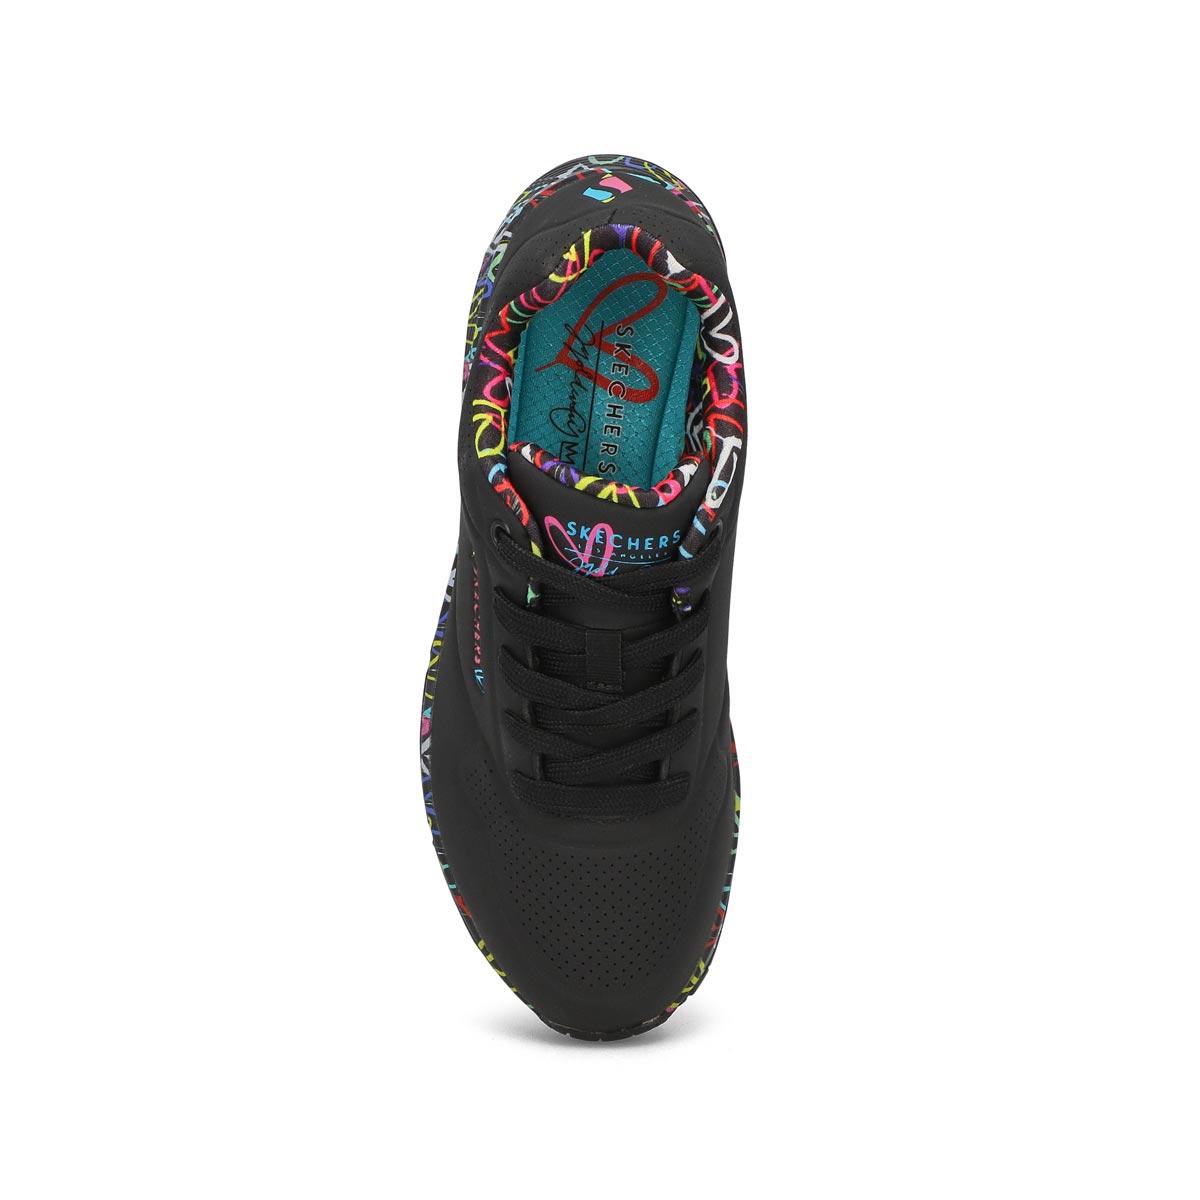 Women's UNO LOVING LOVE black fashion sneakers